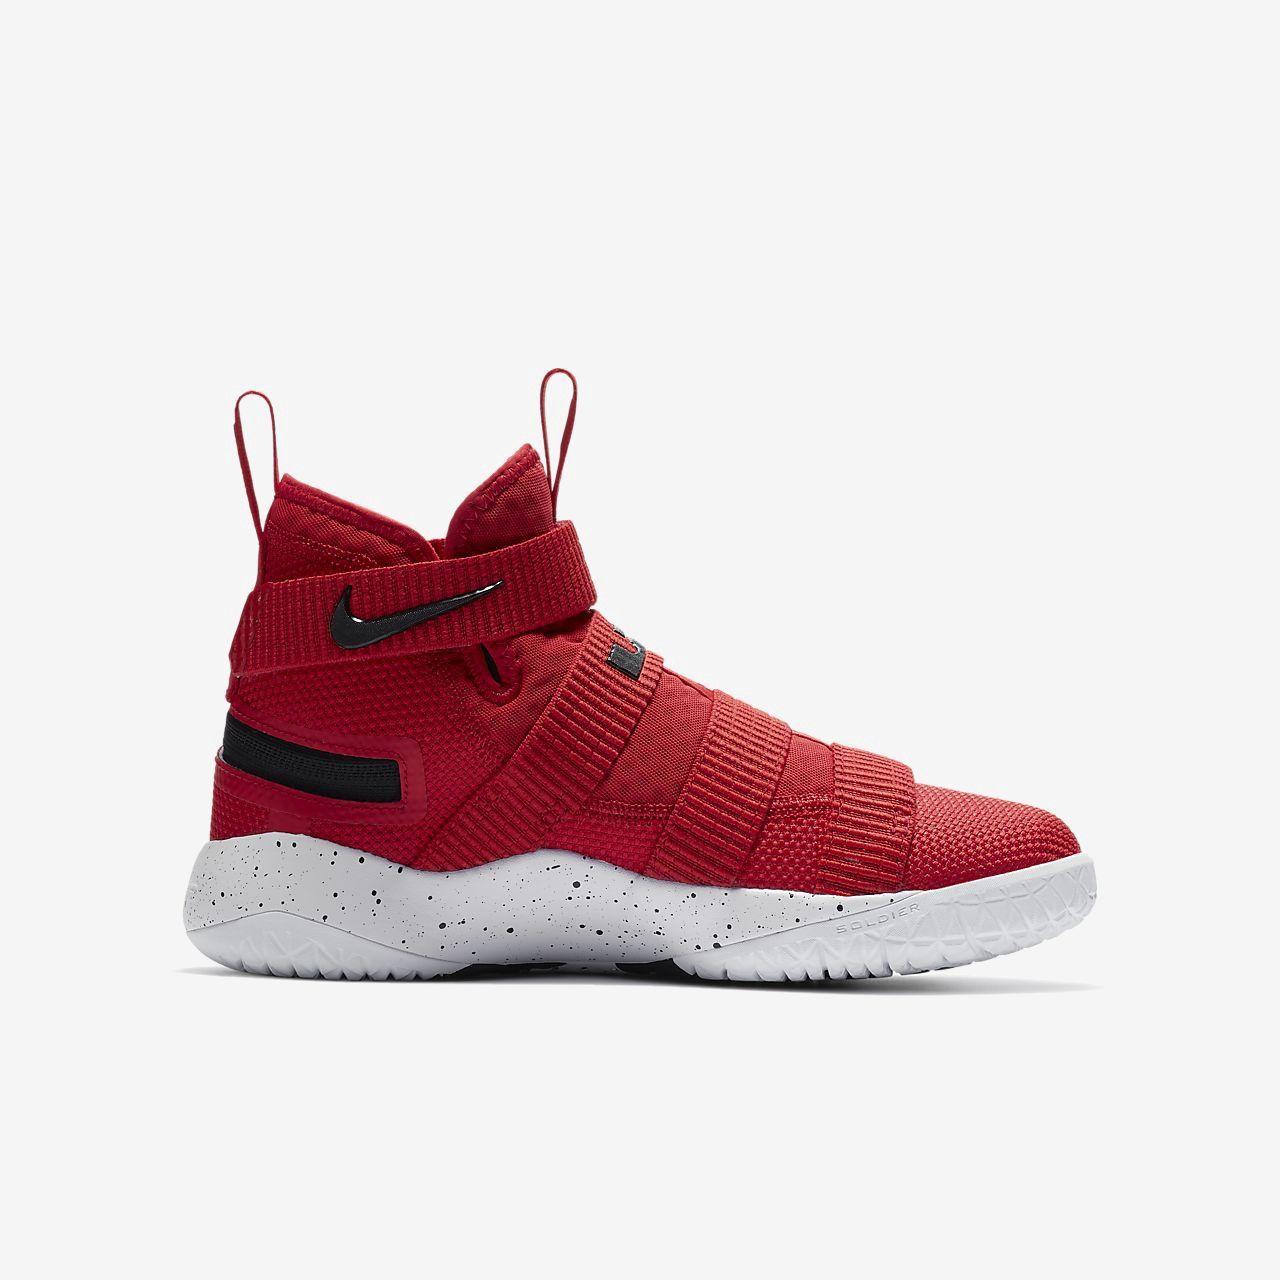 Nike Lebron Soldier Xi Flyease Big Kids